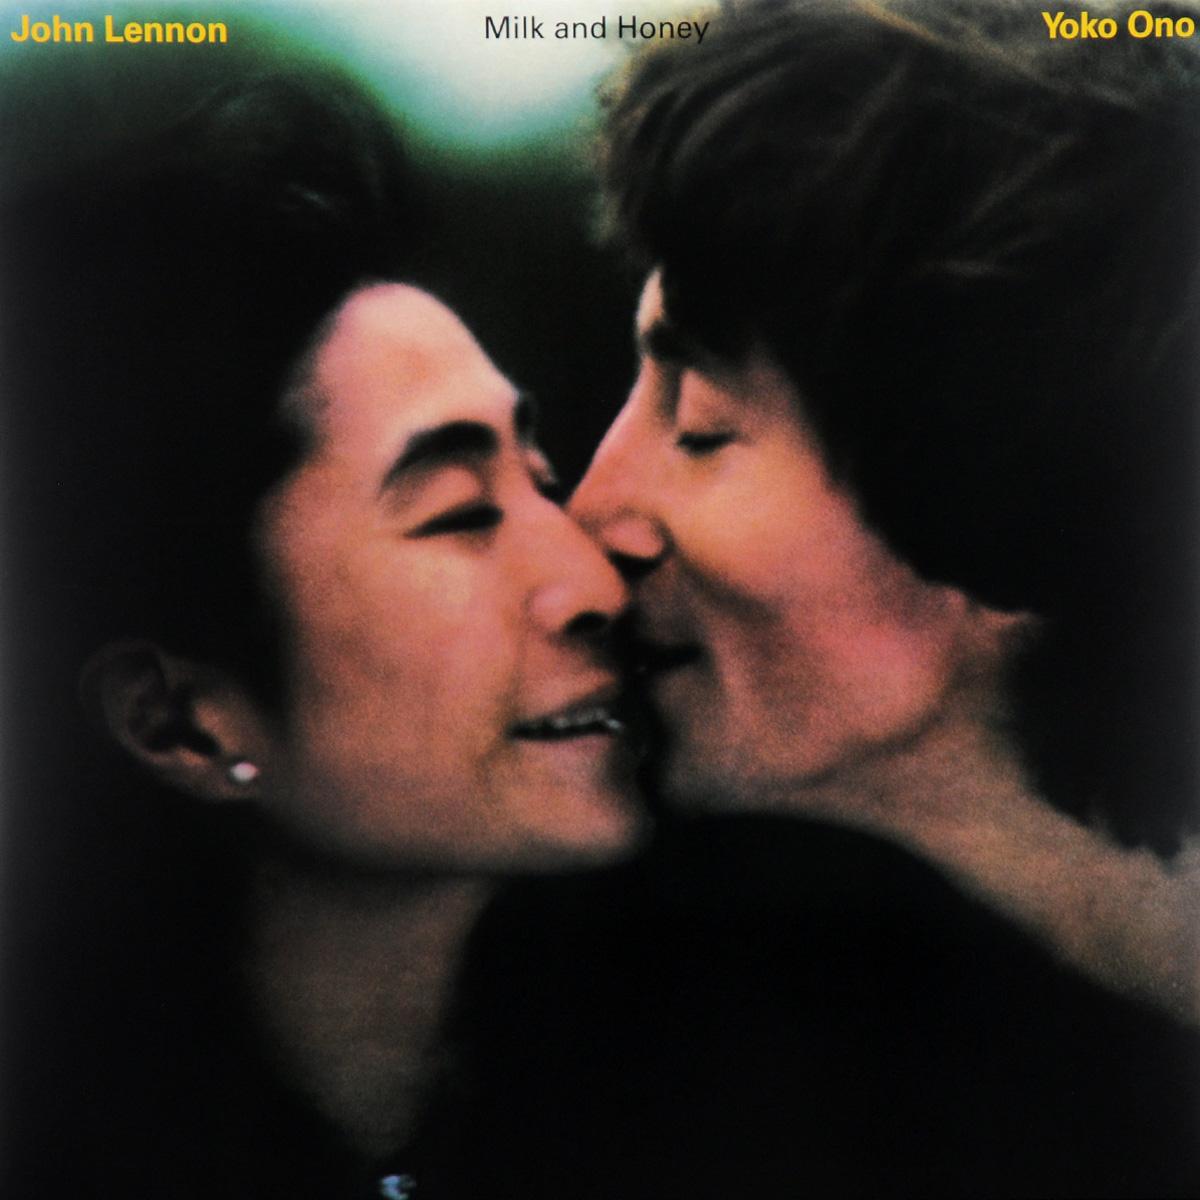 Джон Леннон,Йоко Оно John Lennon / Yoko Ono. Milk And Honey (LP) eglo ono 1 93125